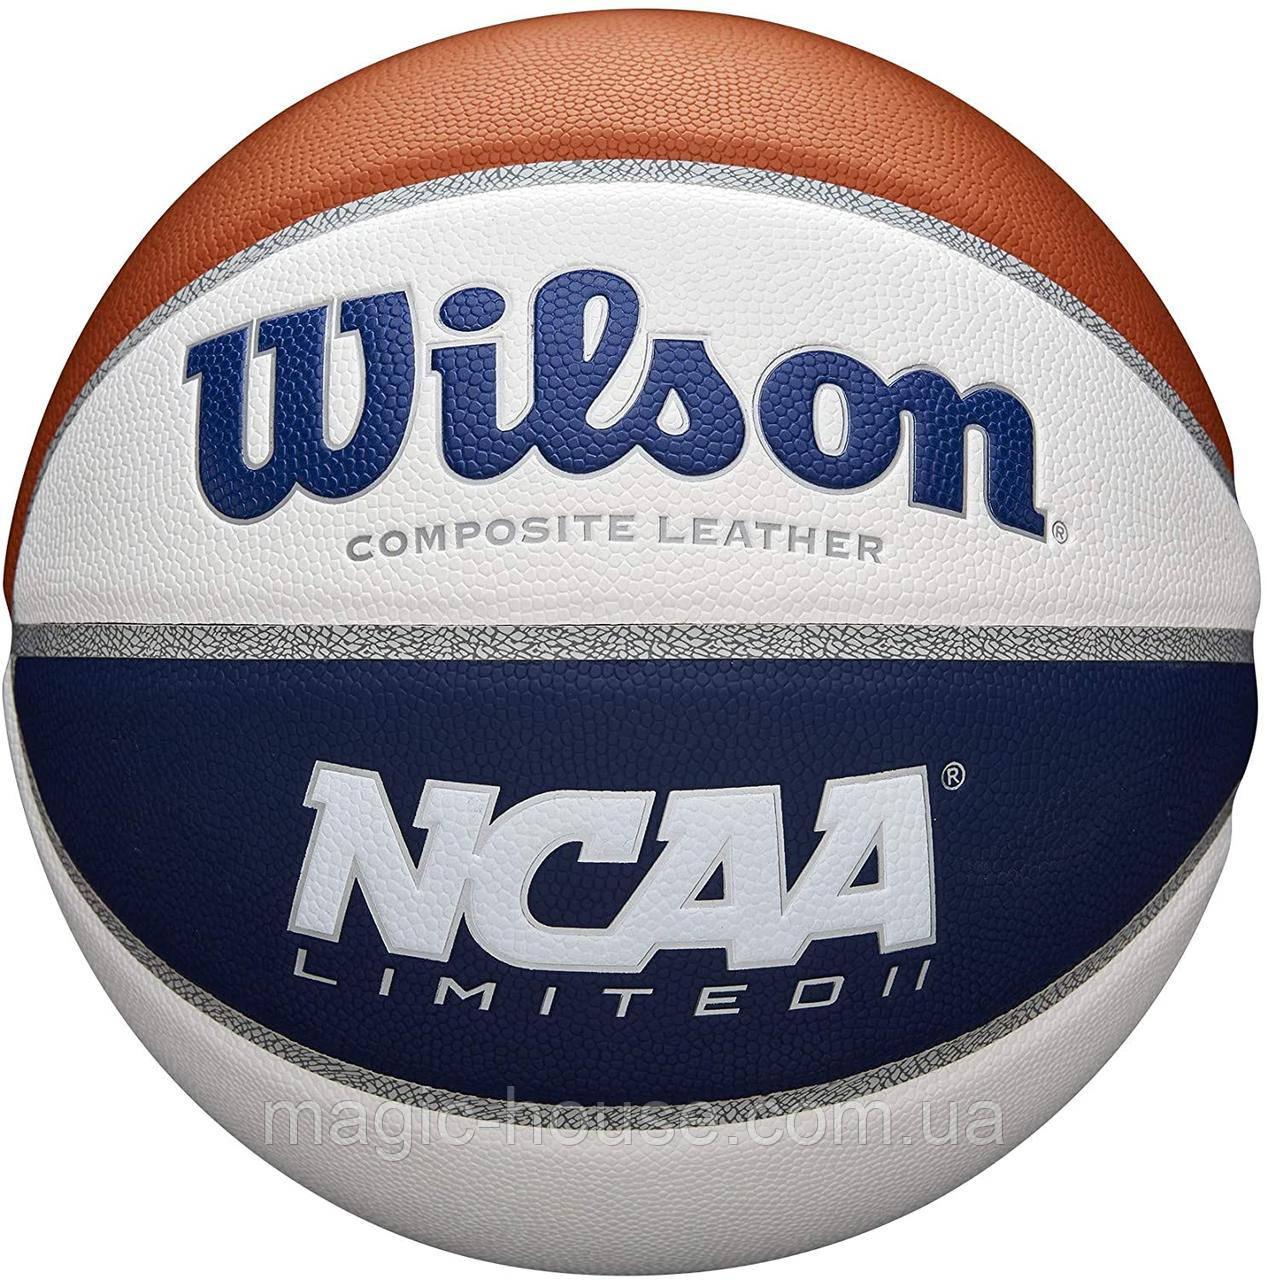 Мяч баскетбольный Wilson NCAA Limited Basketball, Official - 29.5 оригинал размер 7 композитная кожа